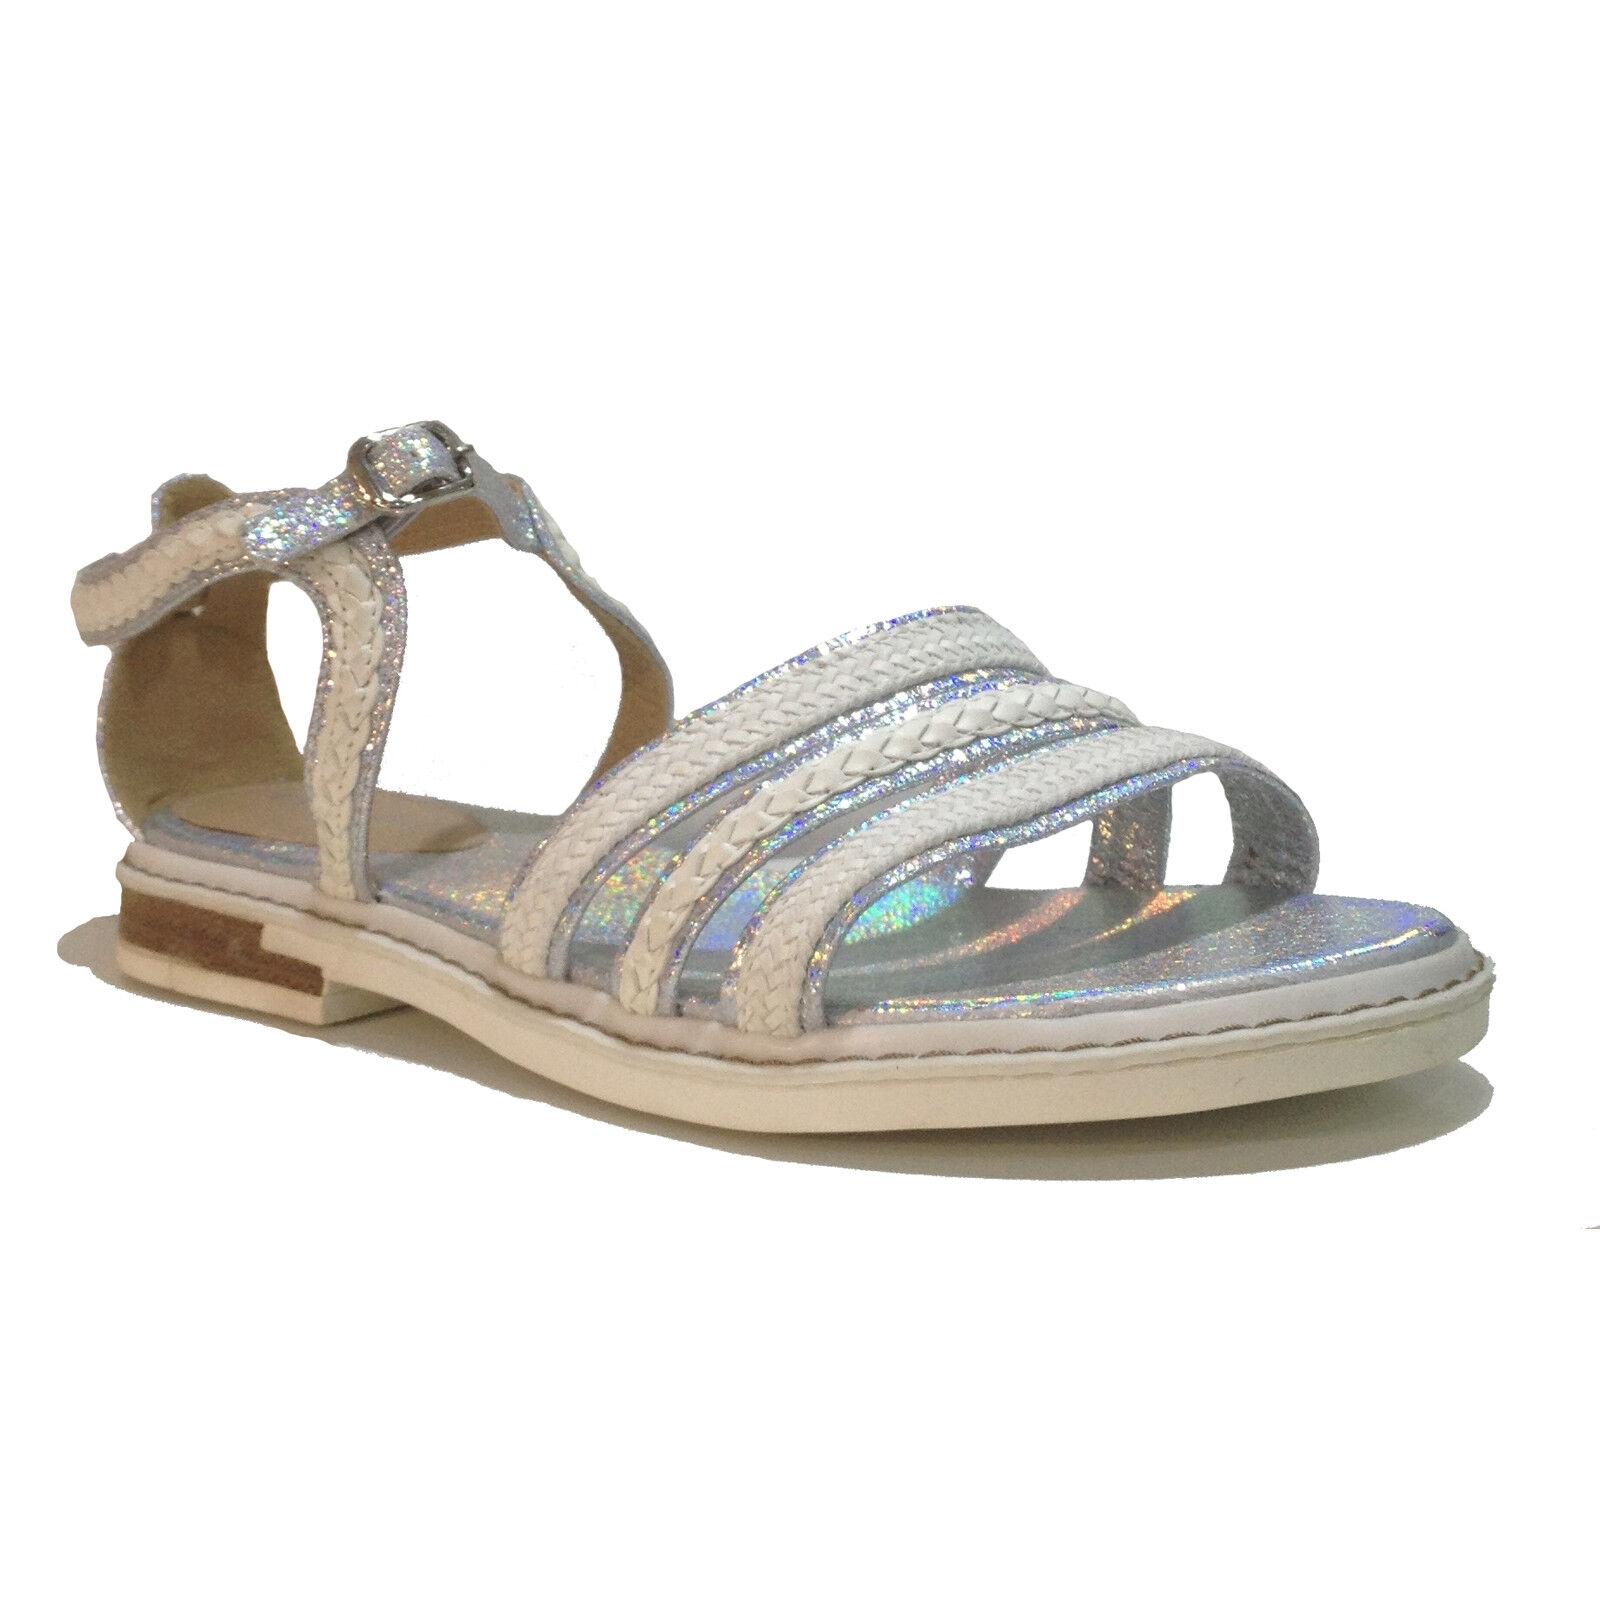 ☼ELEN☼ Sandale - TRENDY TOO - Ref: 0825